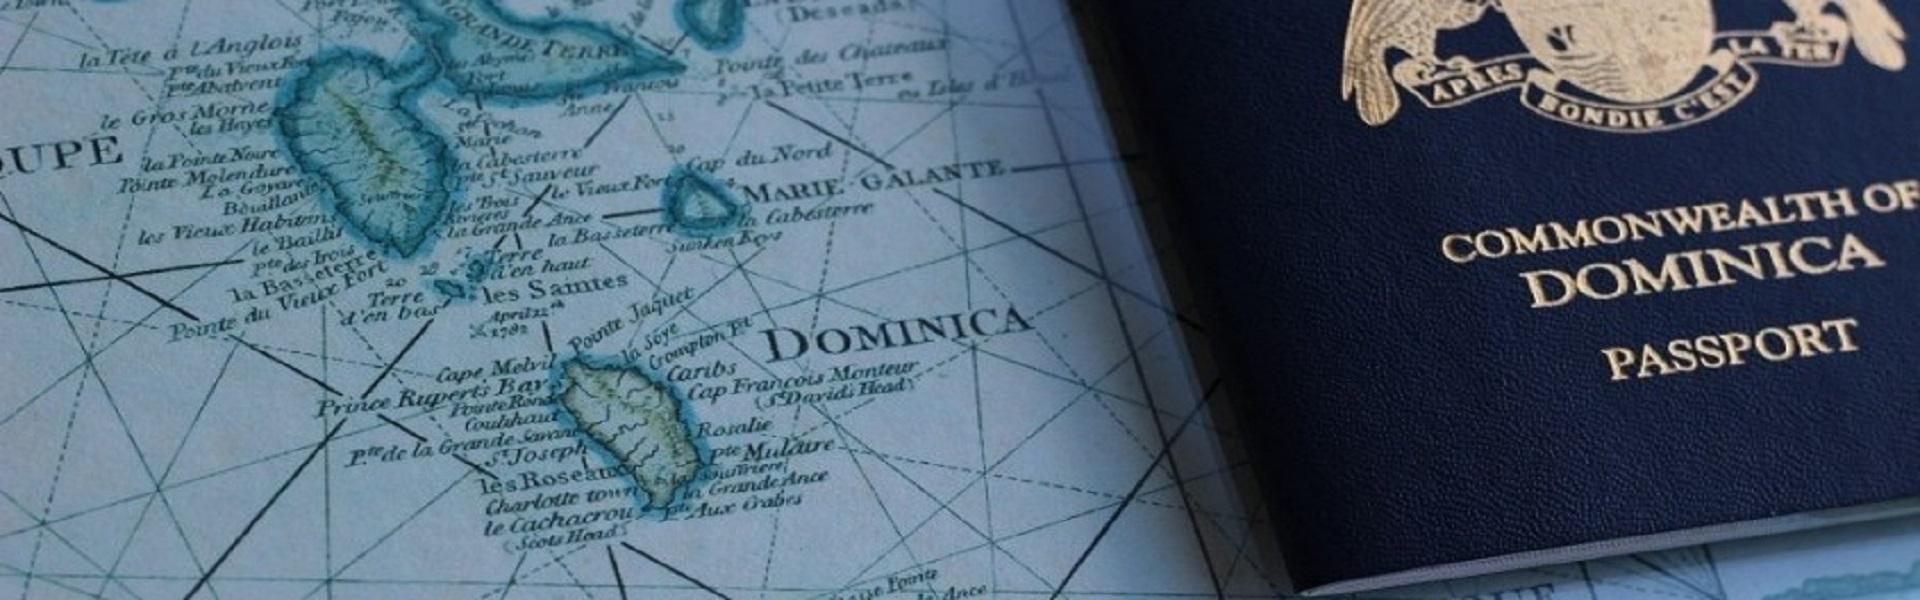 پاسپورت و پذیرش دومینیکا